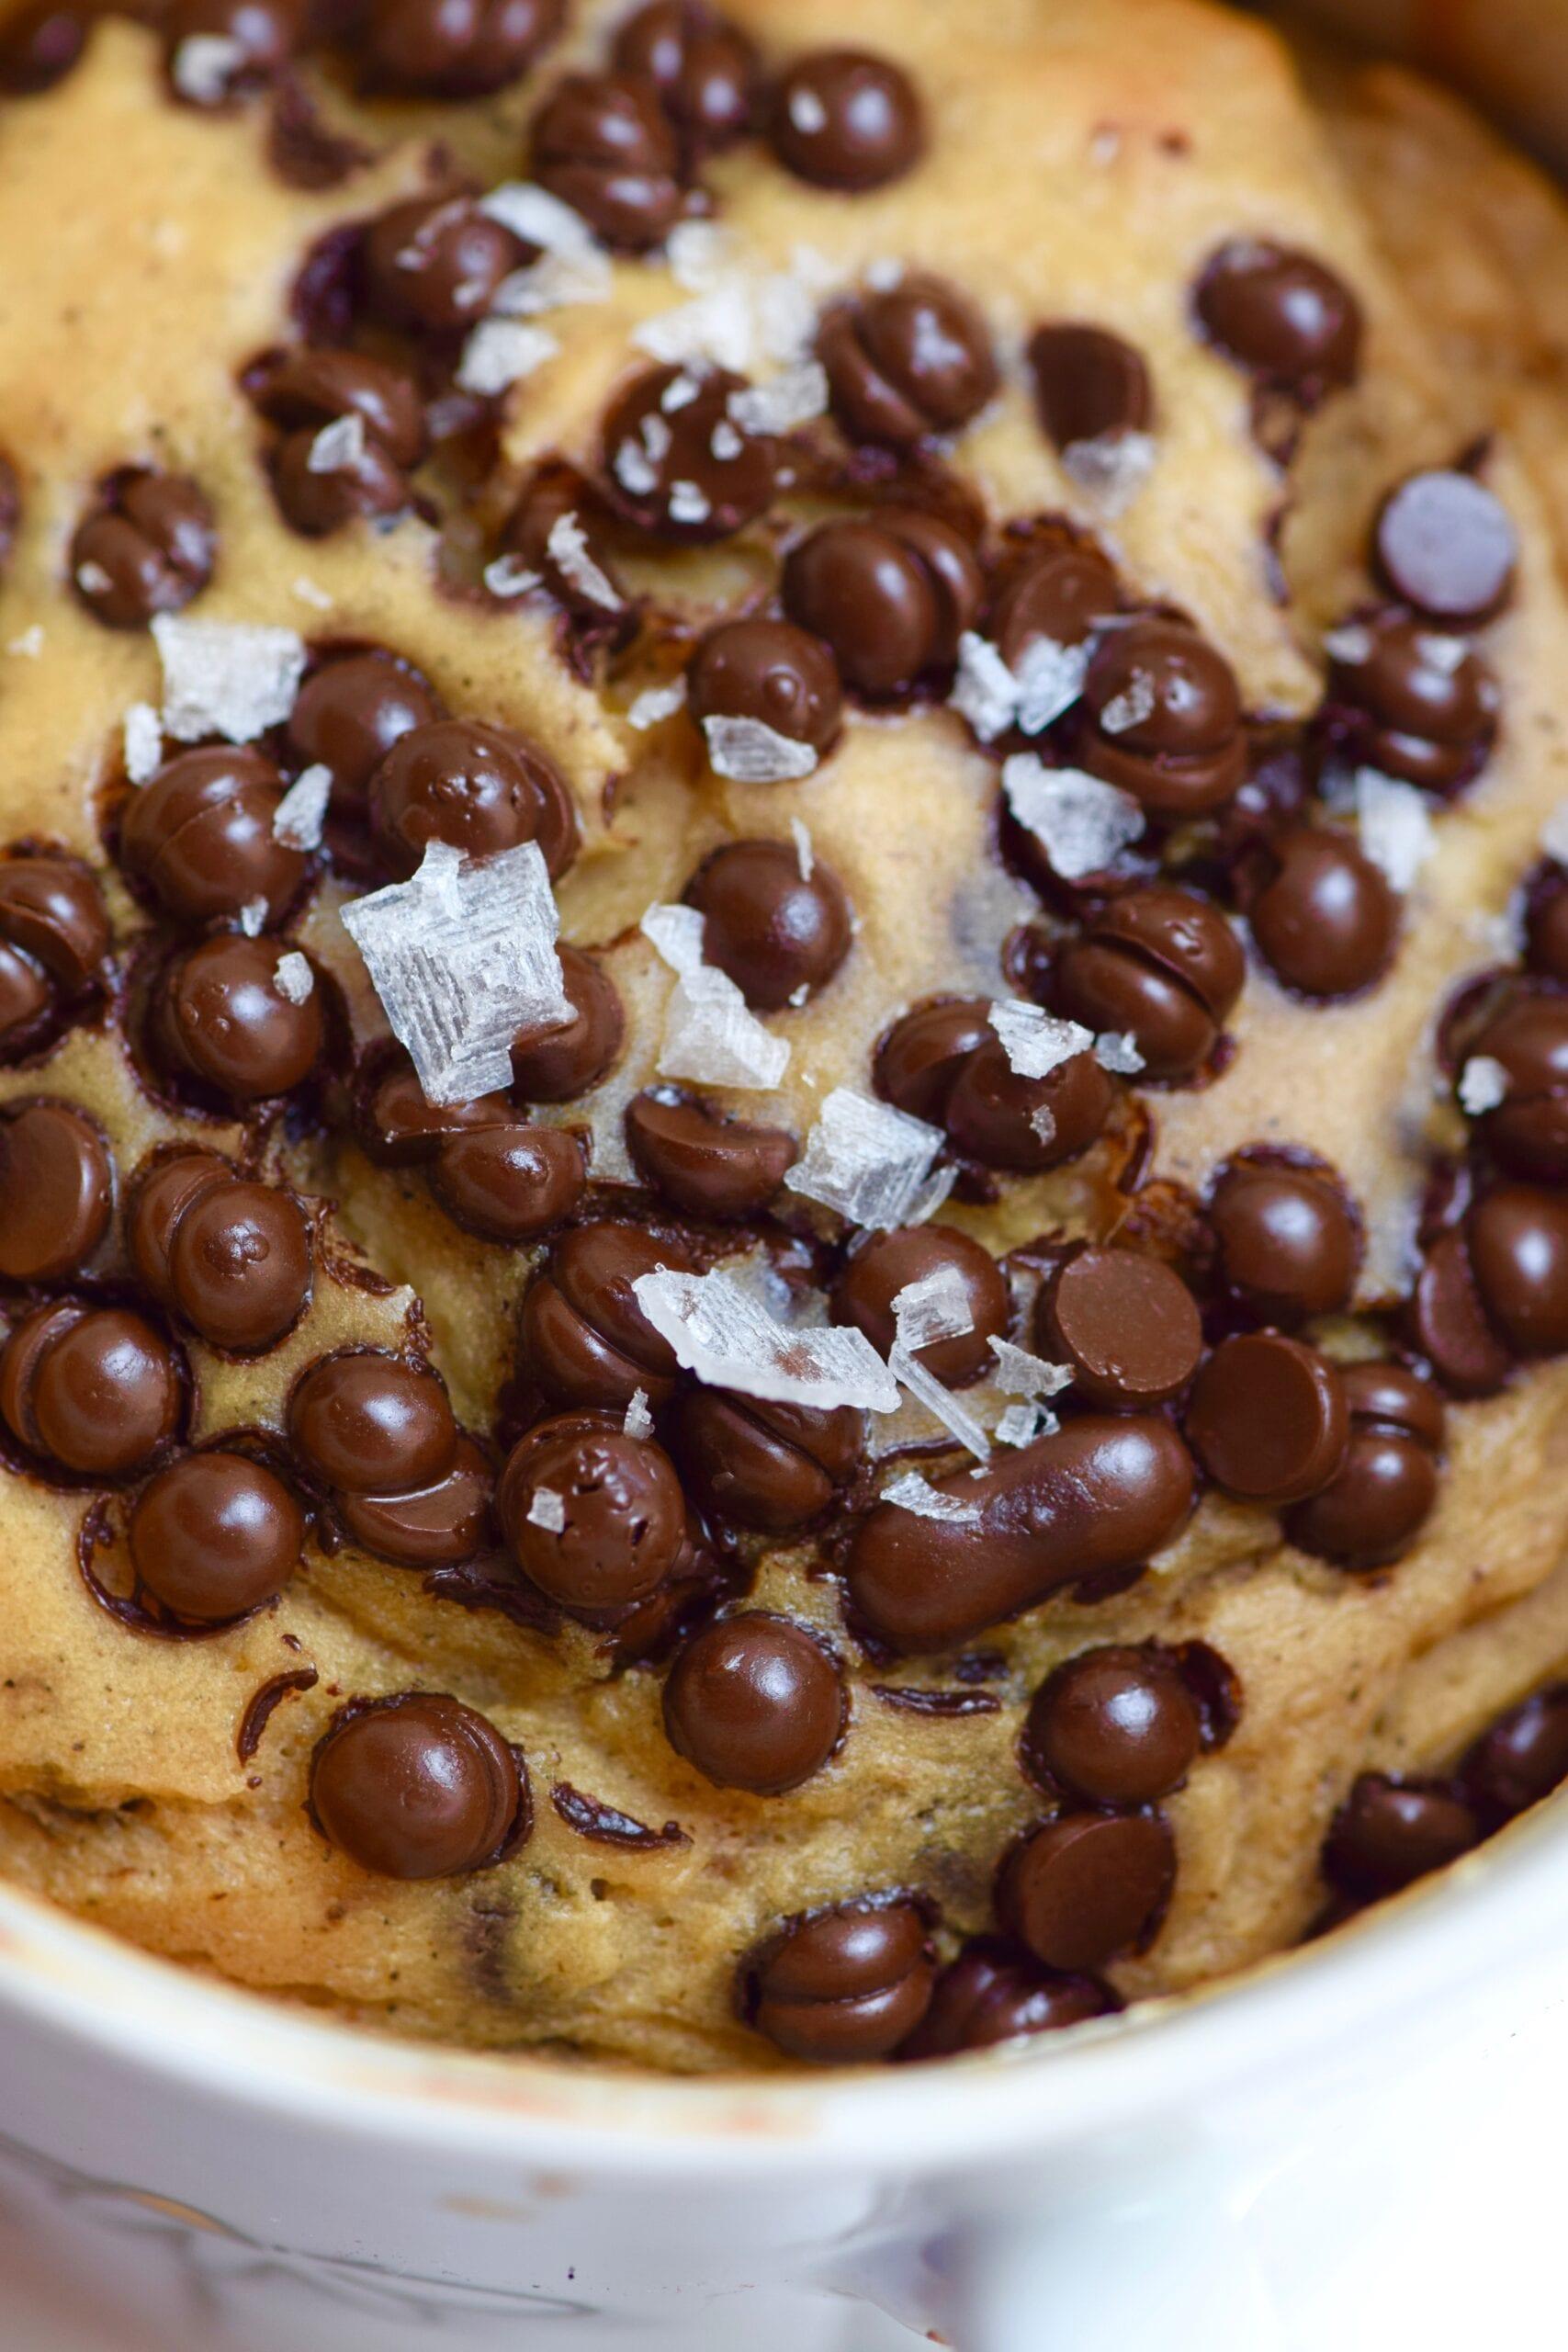 Dark chocolate sea salt single serving baked protein cookie recipe